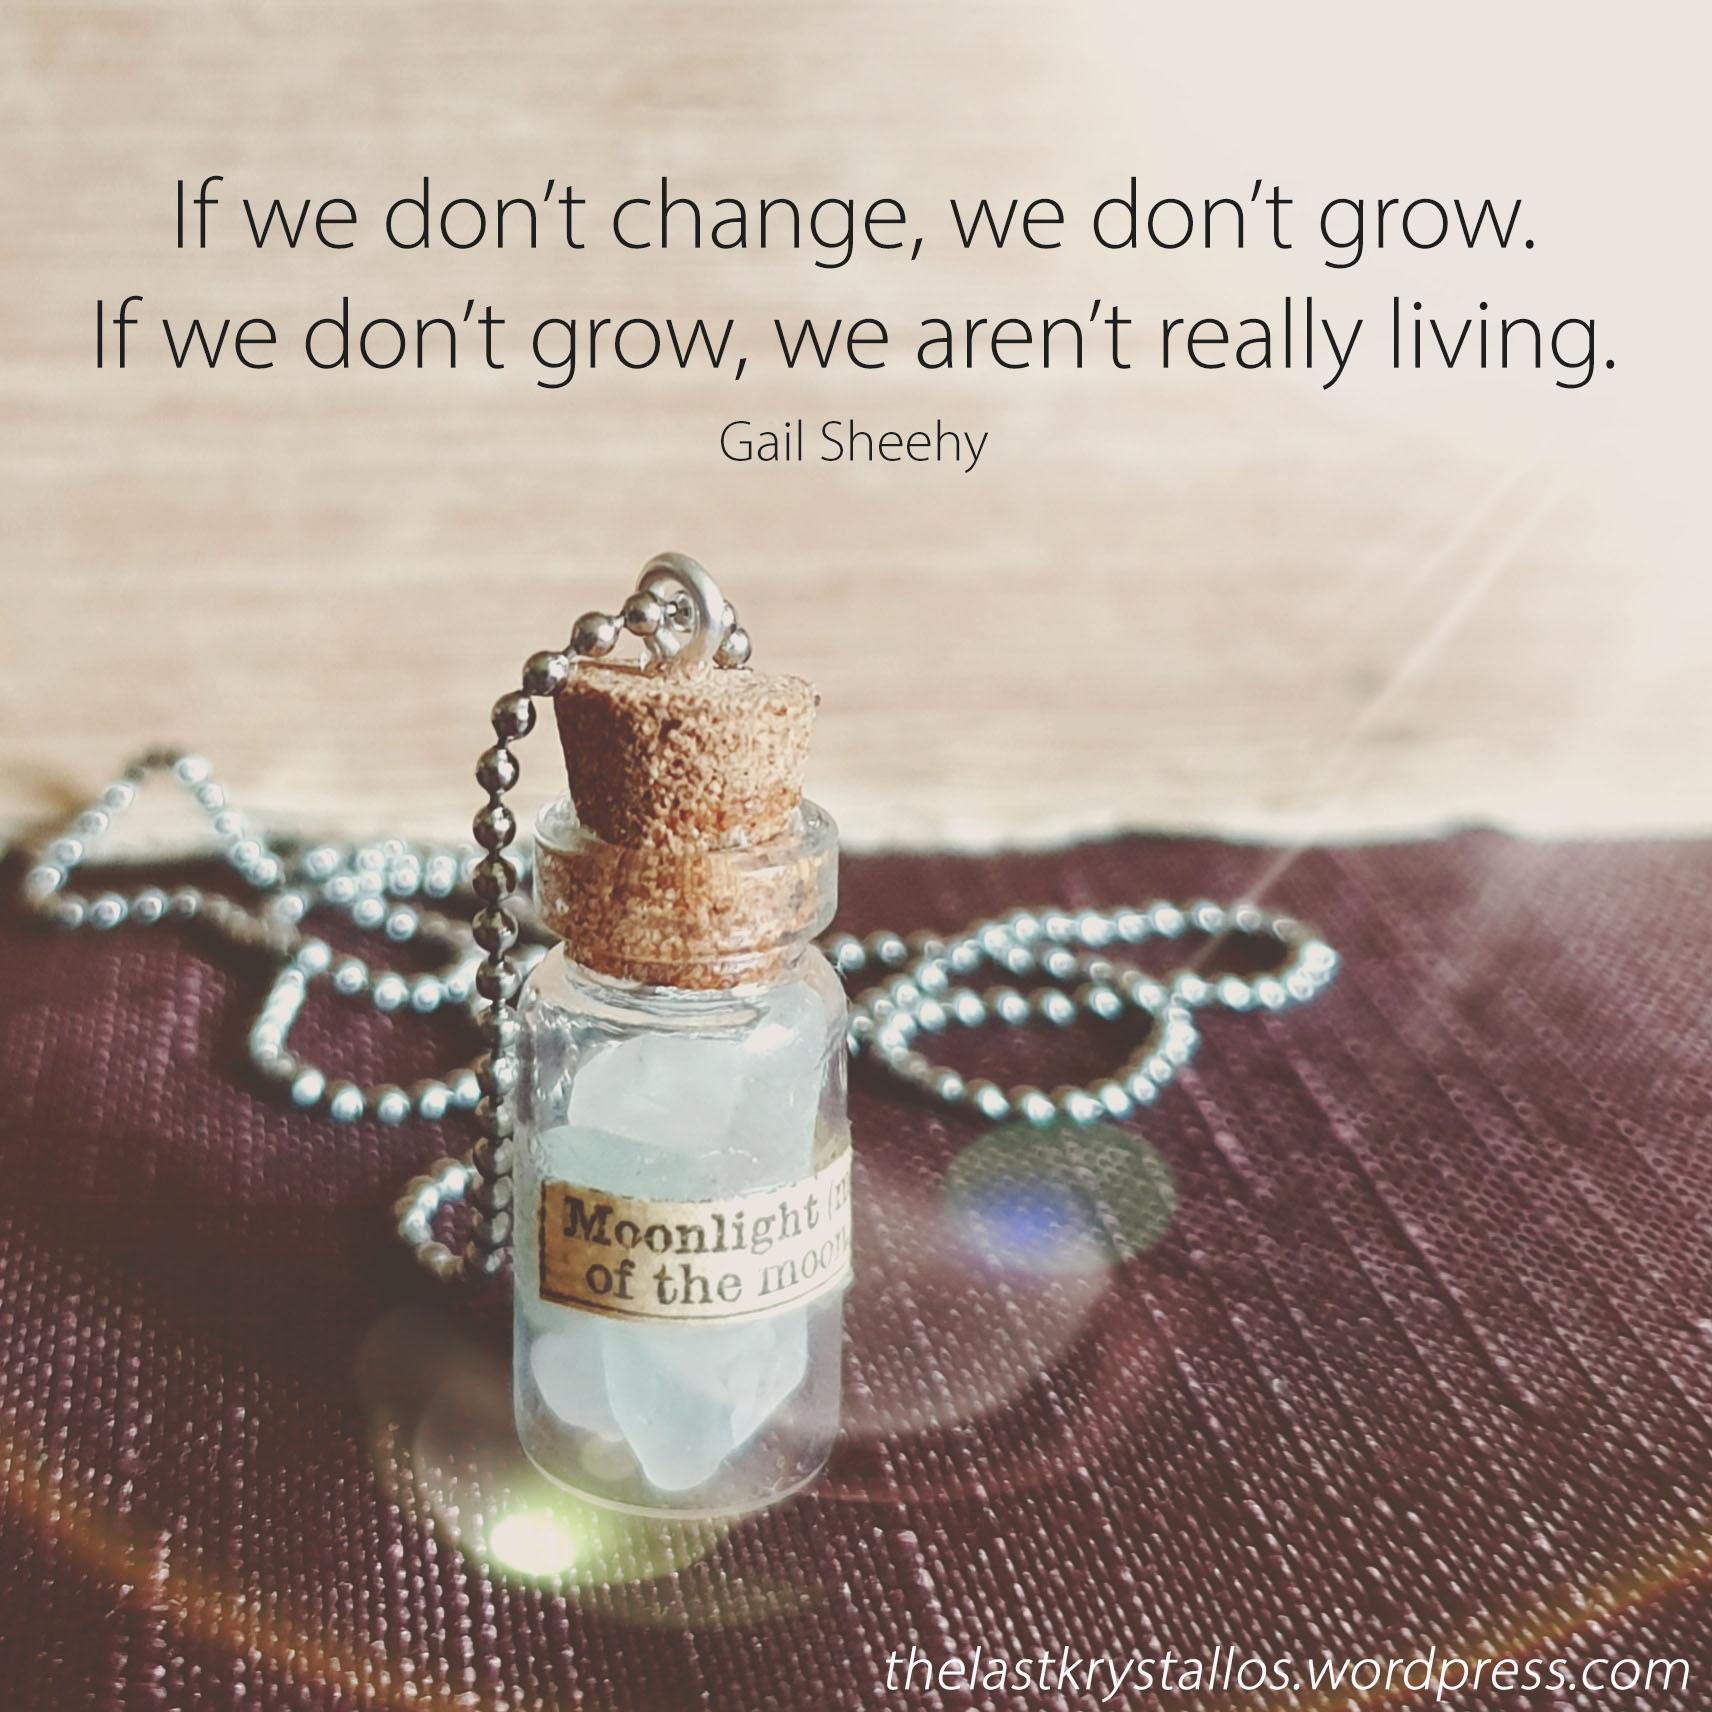 If we don't change, we don't grow. If we don't grow, we aren't really living – Gail Sheehy